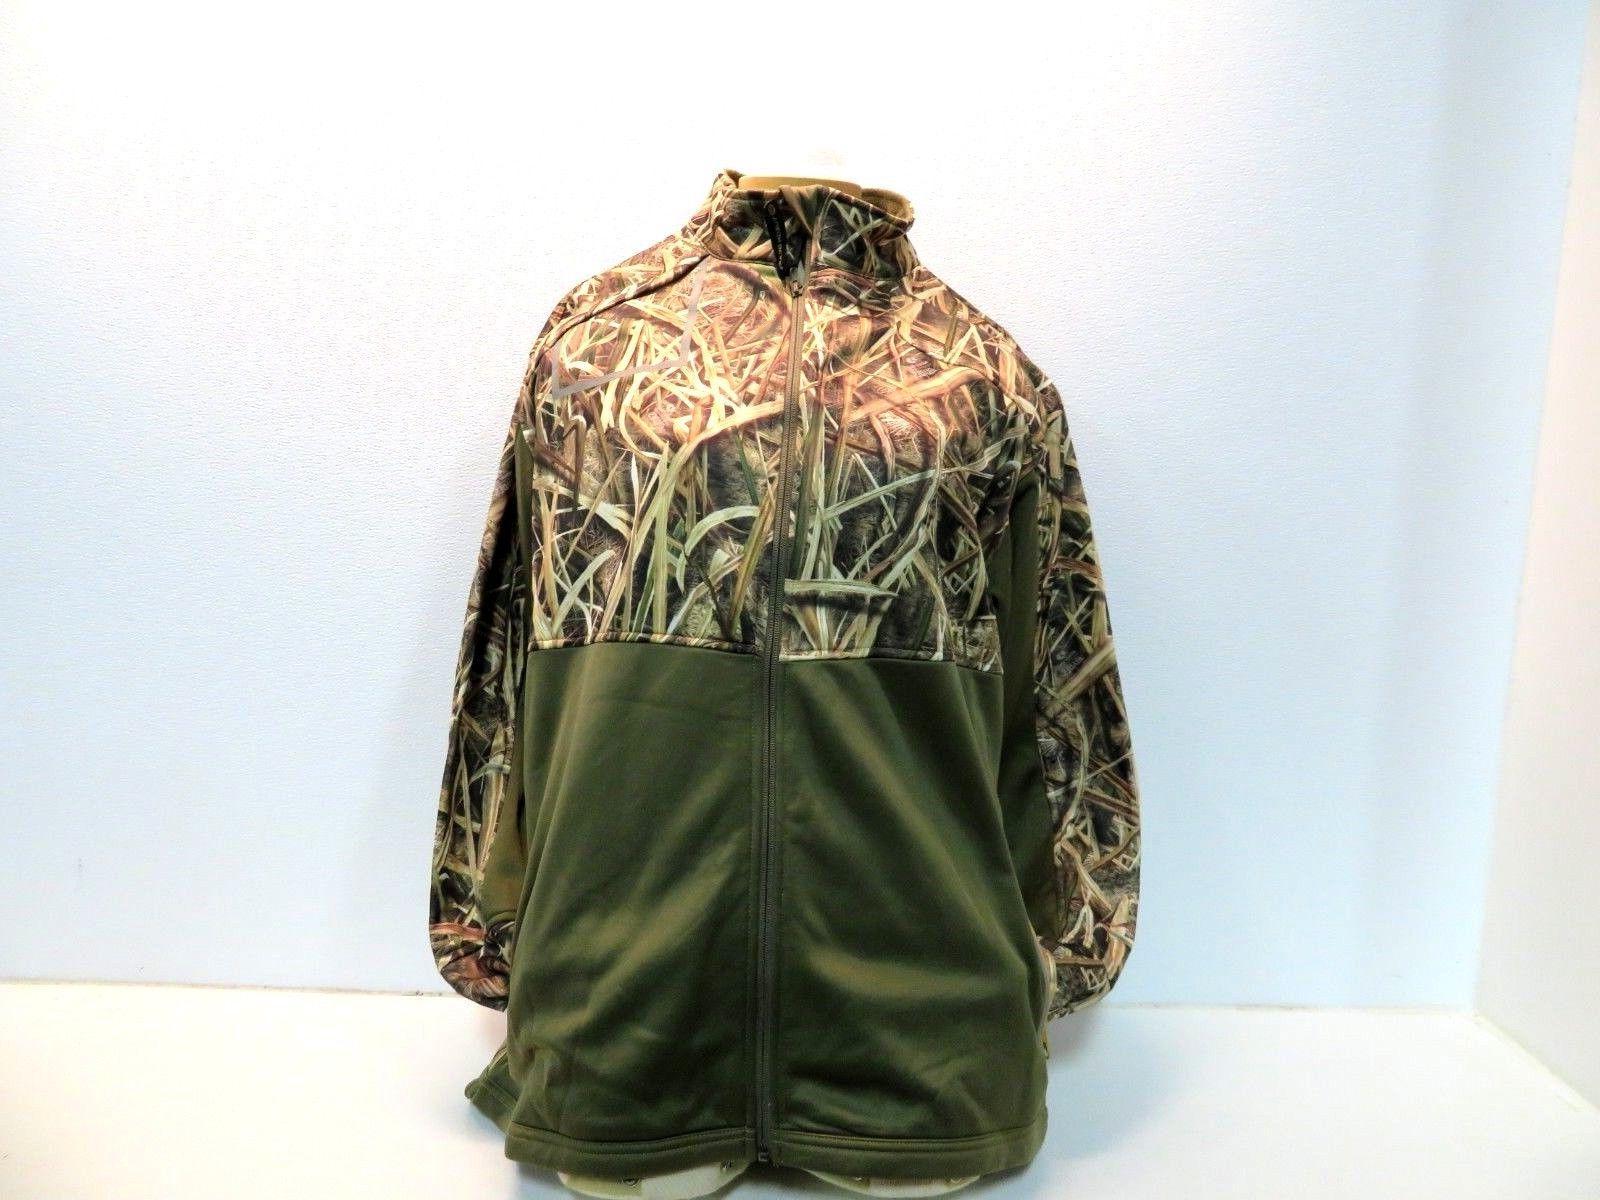 Yukon Gear Longe Sleeve Mid-Layer Jacket